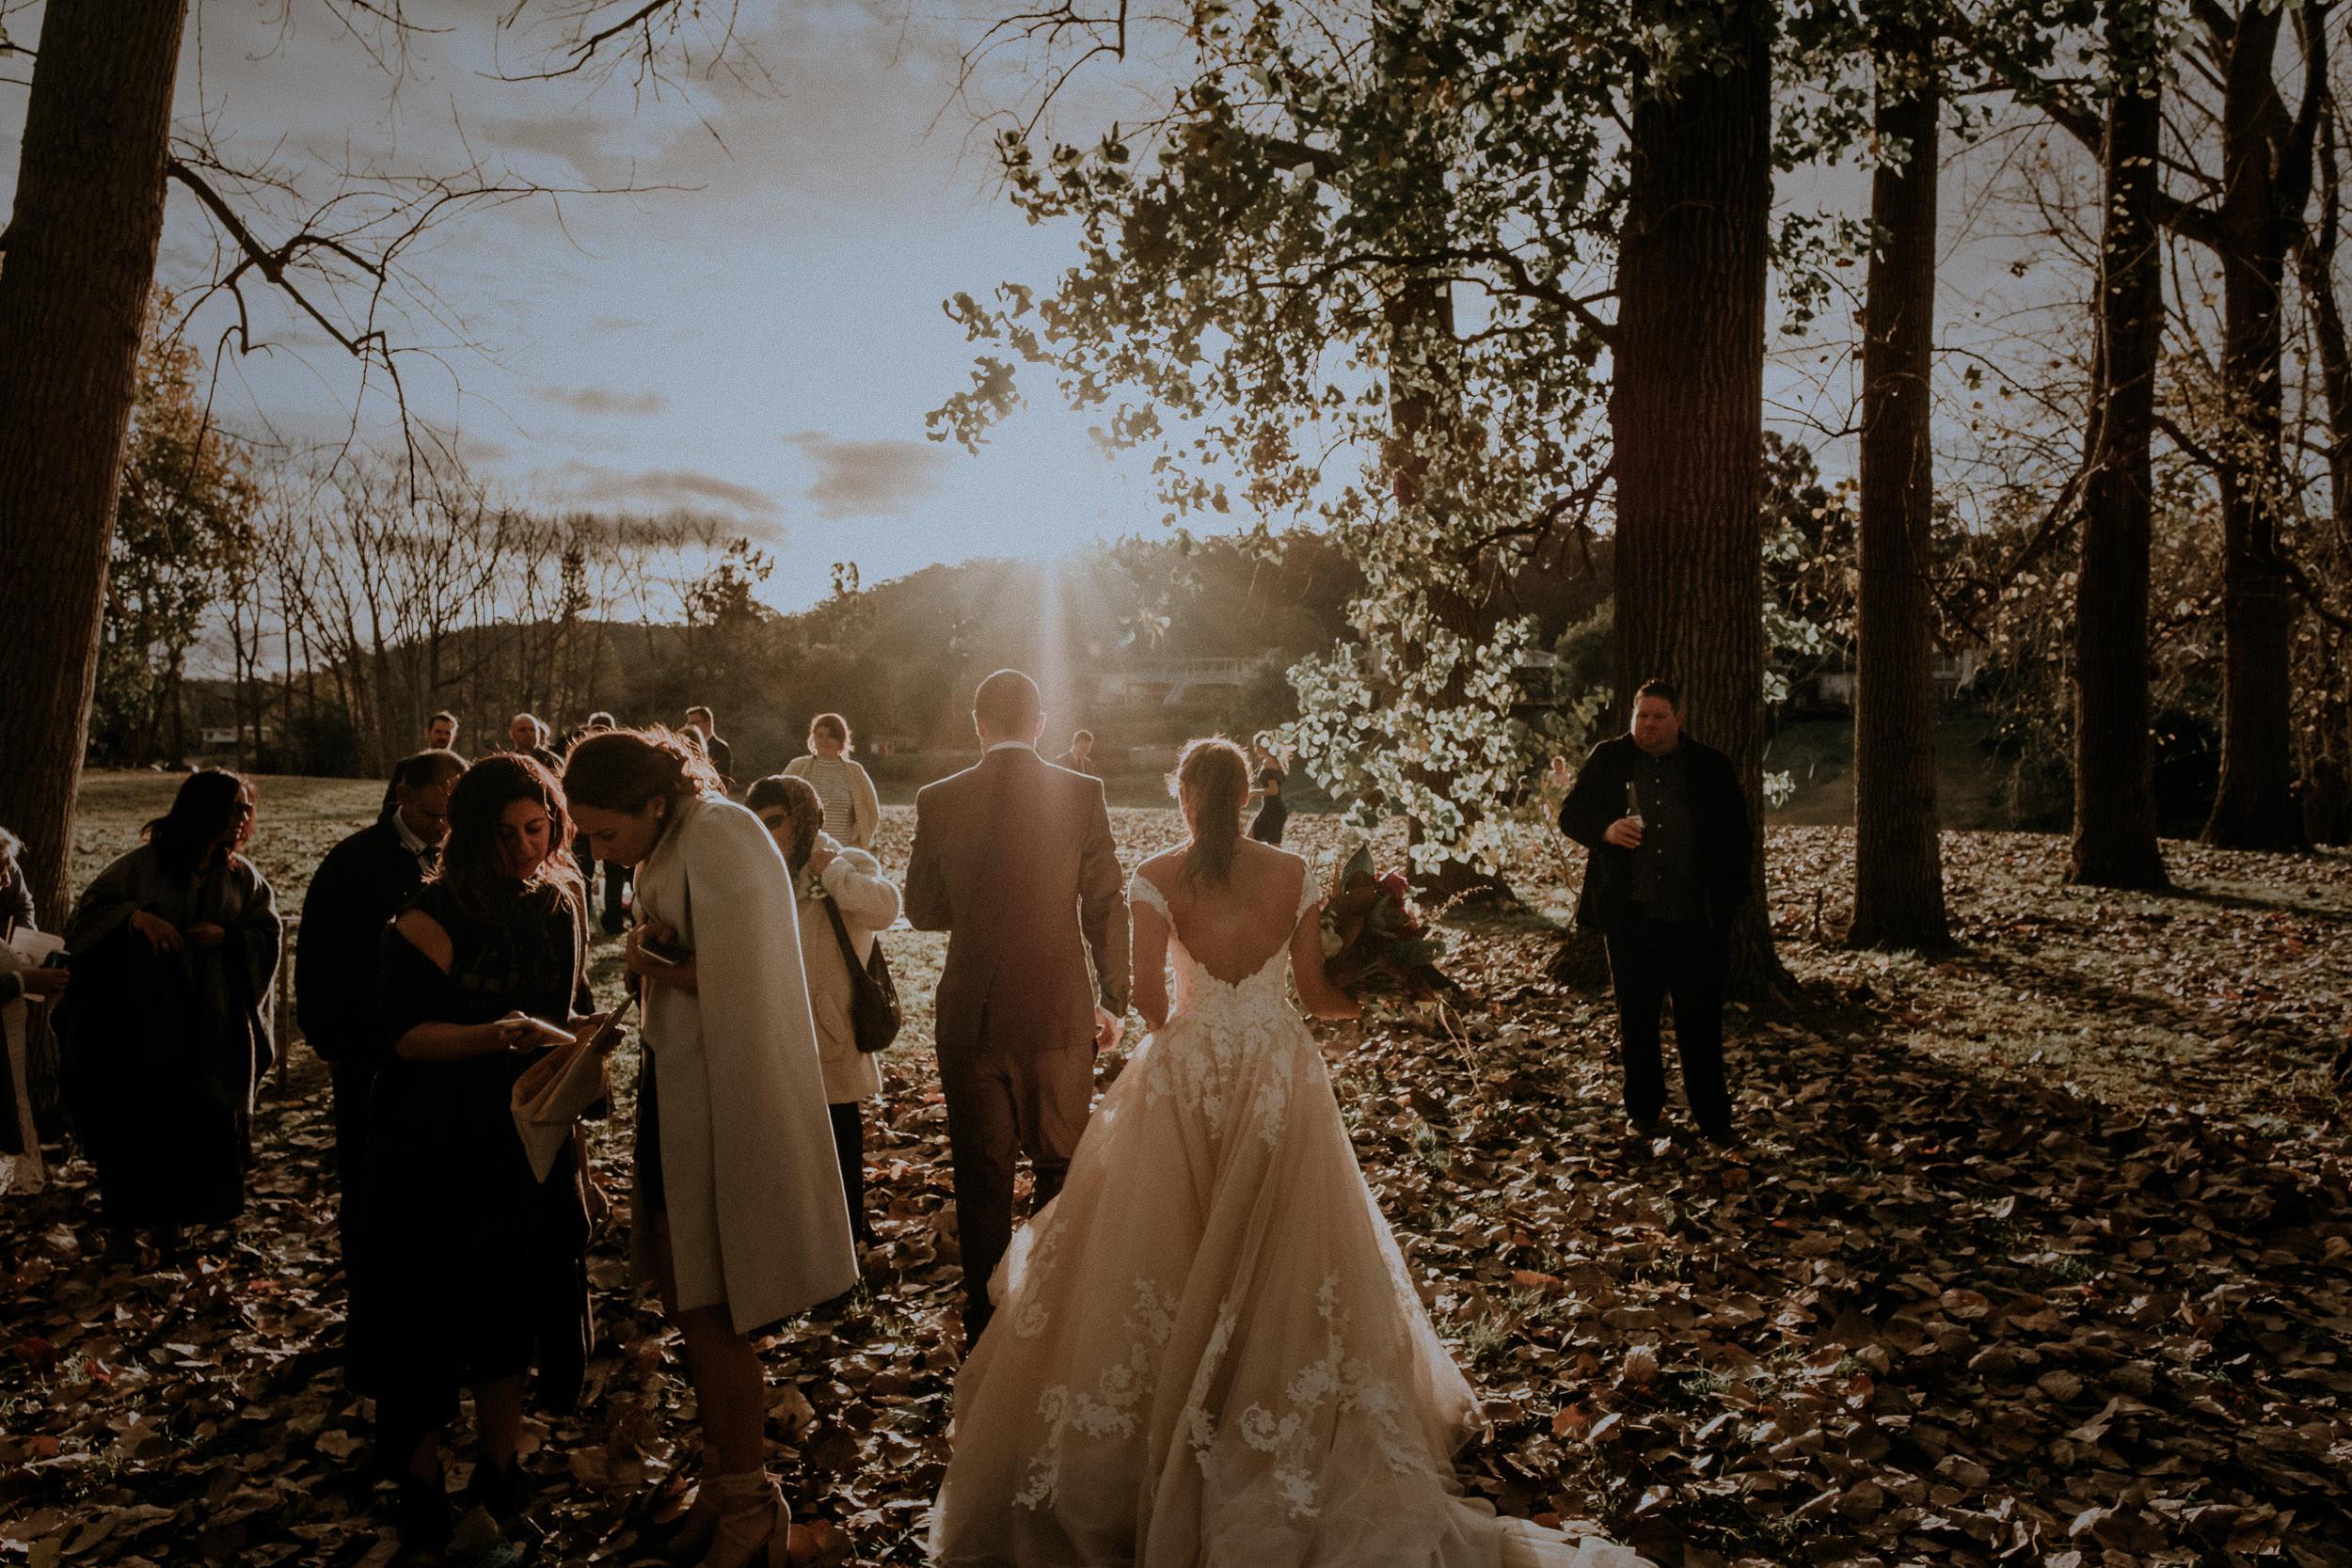 g_c wedding - kings _ thieves elopement wedding photography - blog 72.jpg